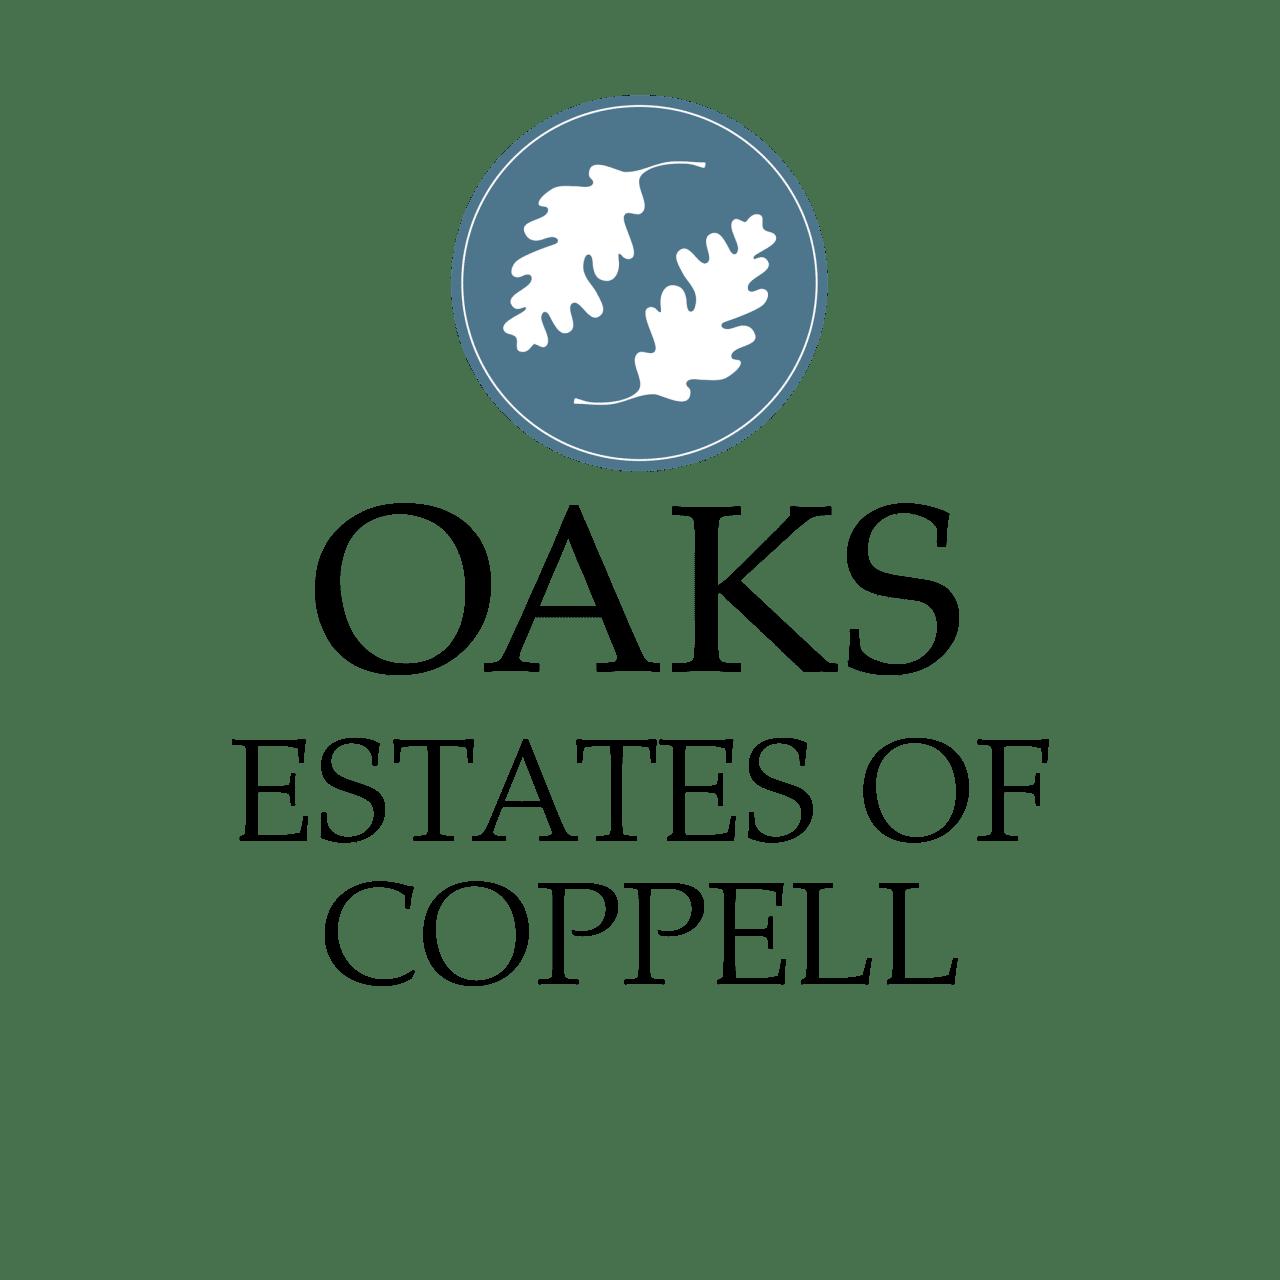 Oaks Estates of Coppell